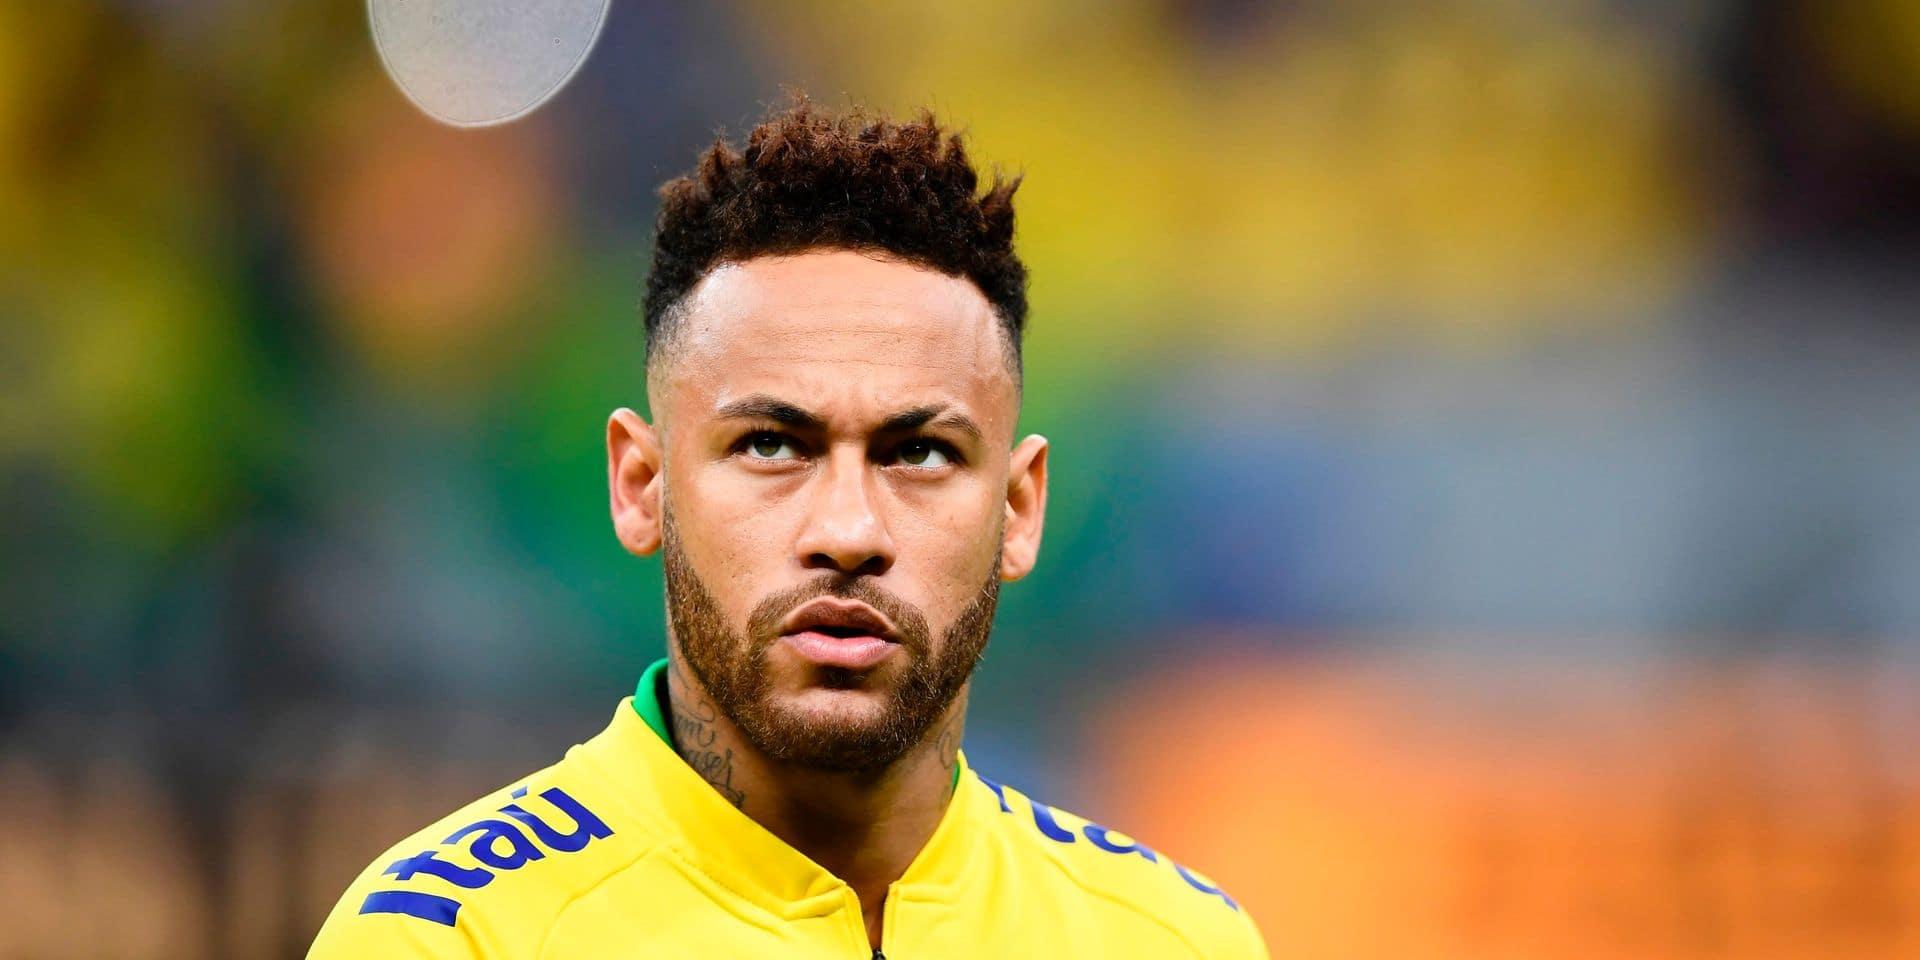 Neymar et le Barça, la telenovela du mercato